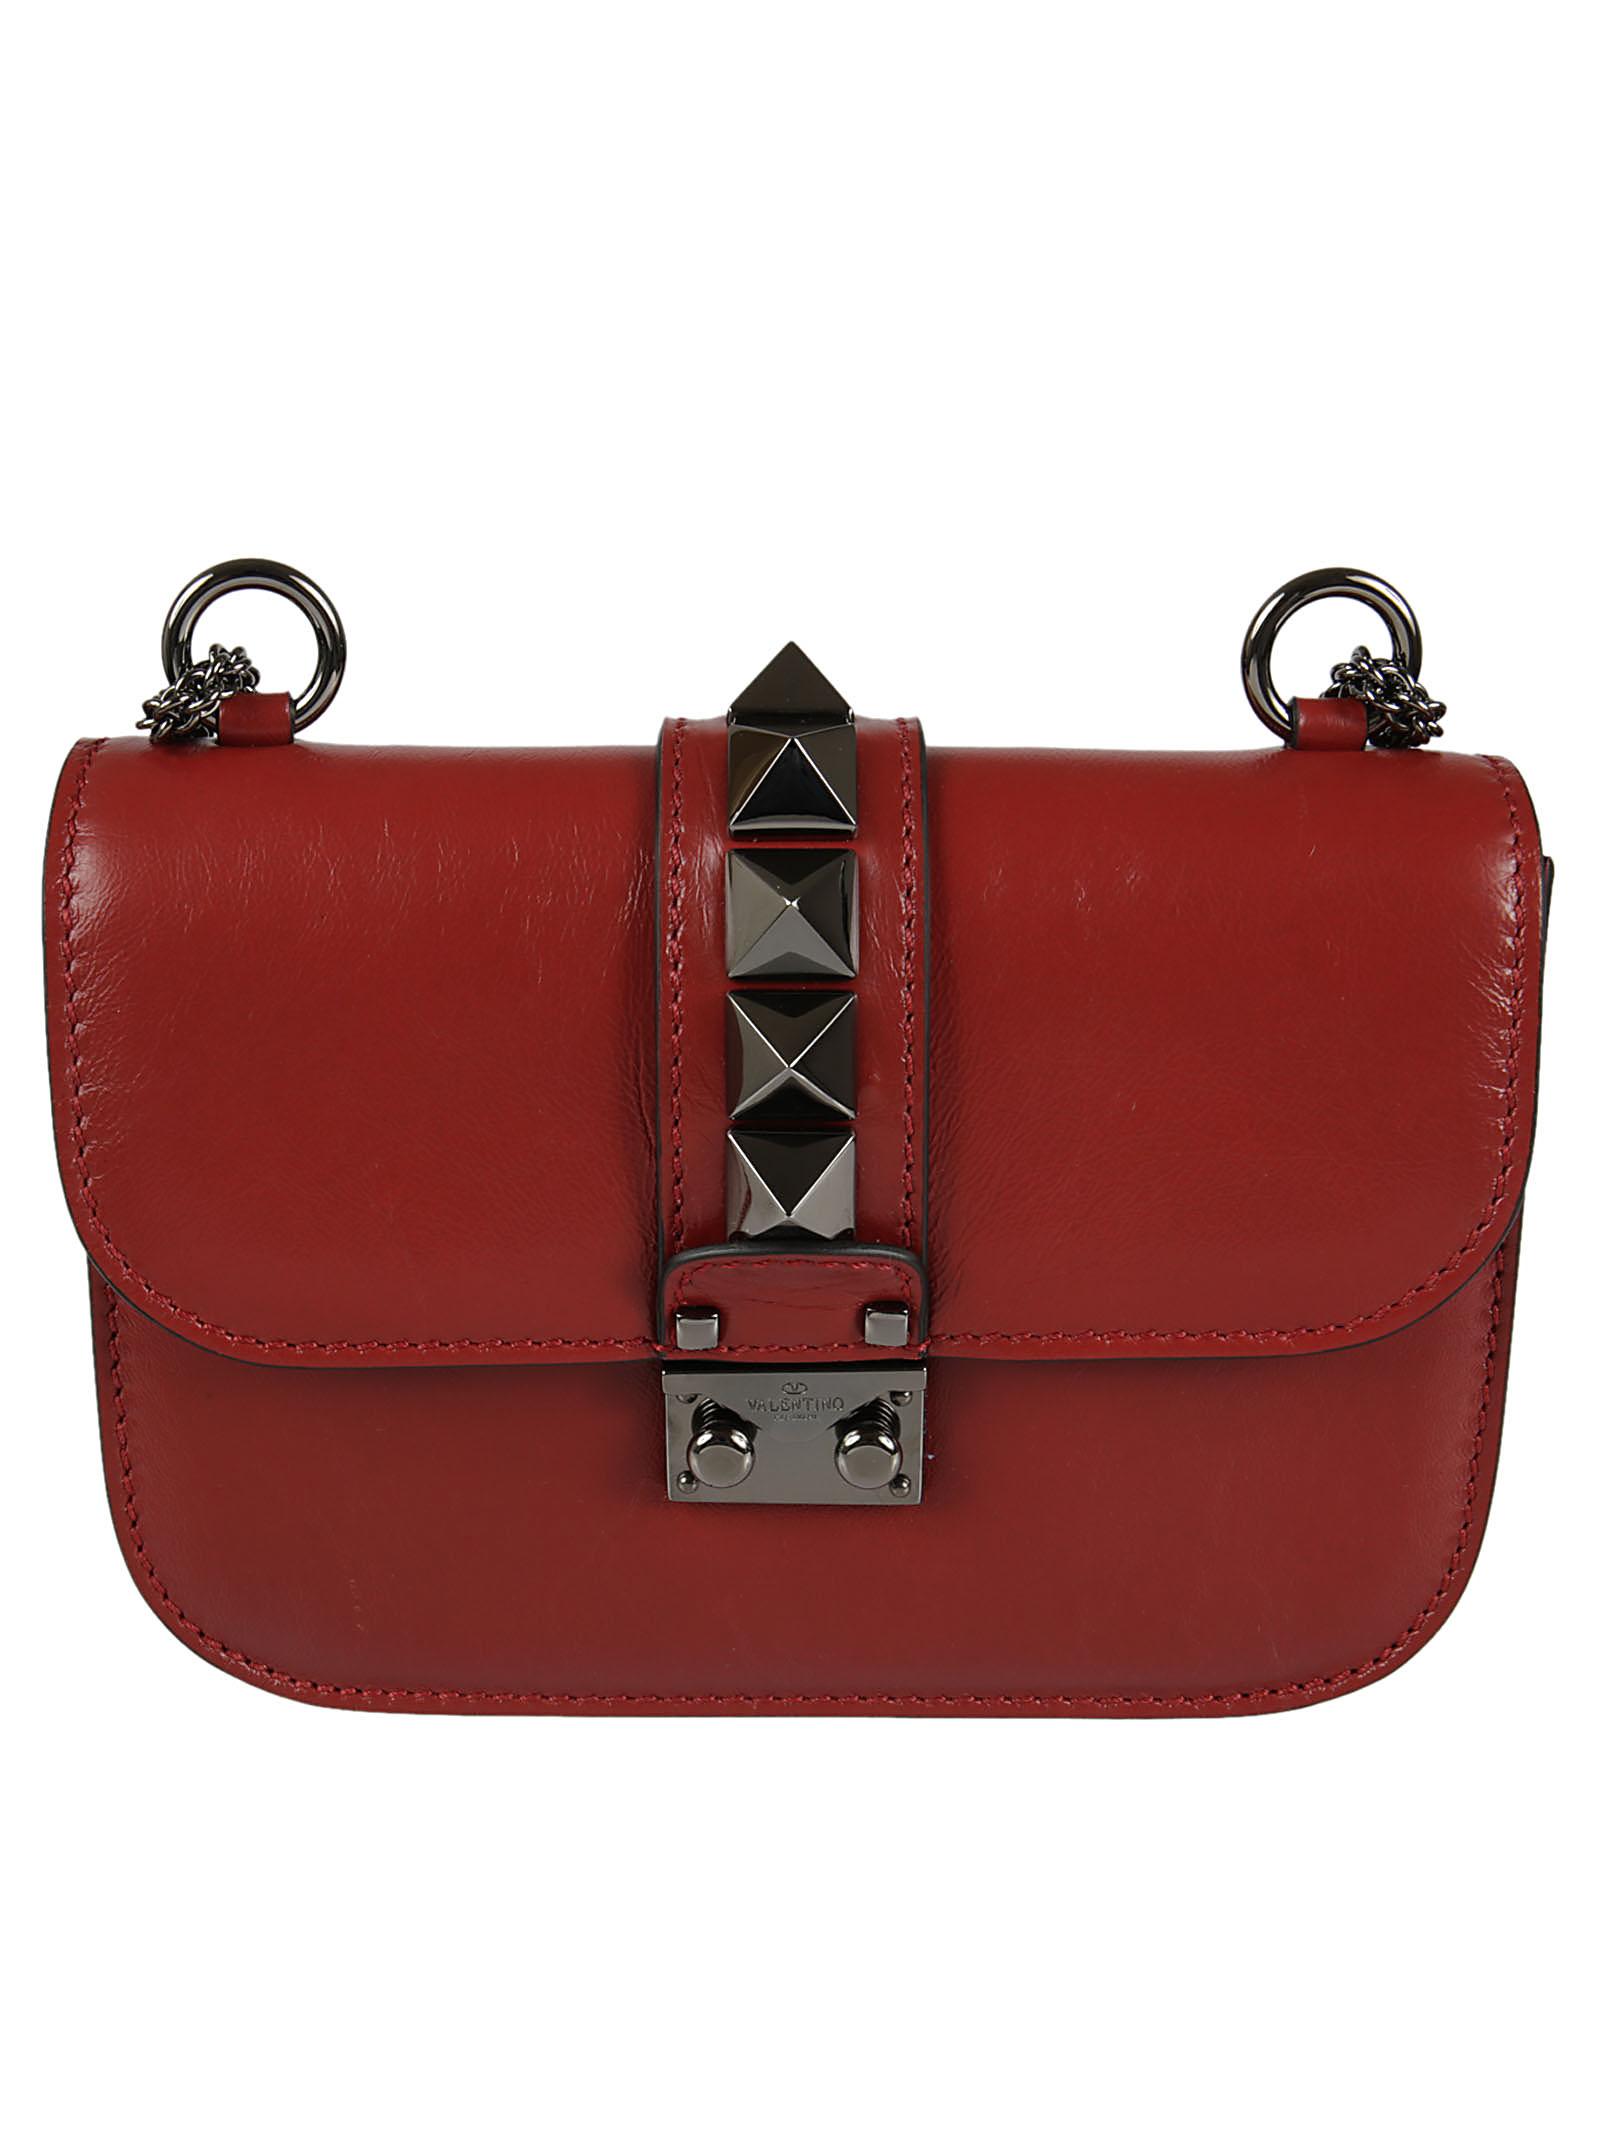 Valentino Garavani Valentino Garavani Glam Lock Shoulder Bag